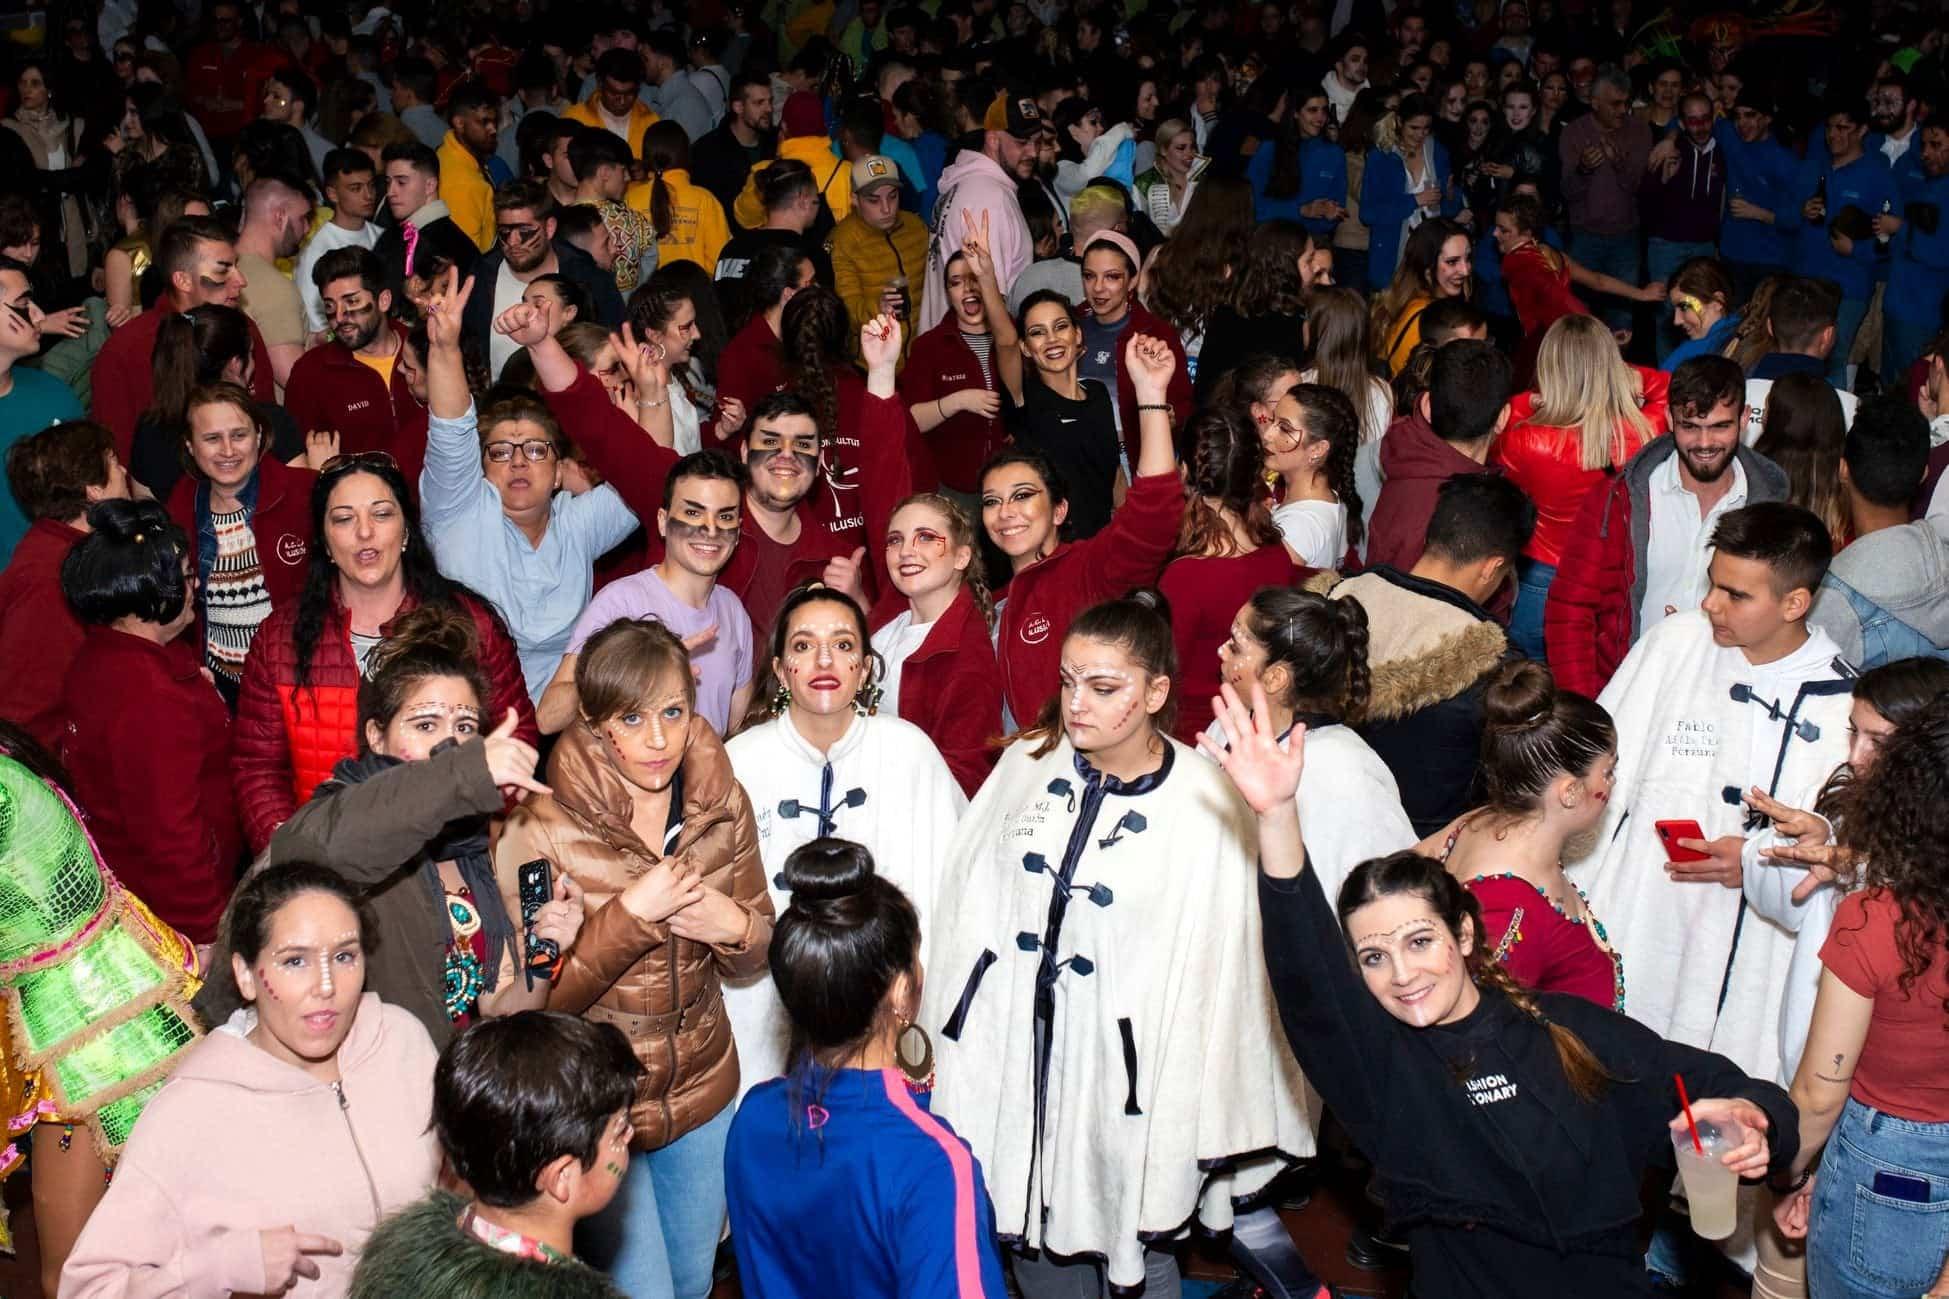 Carnaval de herencia 2020 ofertorio 17 - Selección de fotografías del Ofertorio del Carnaval de Herencia